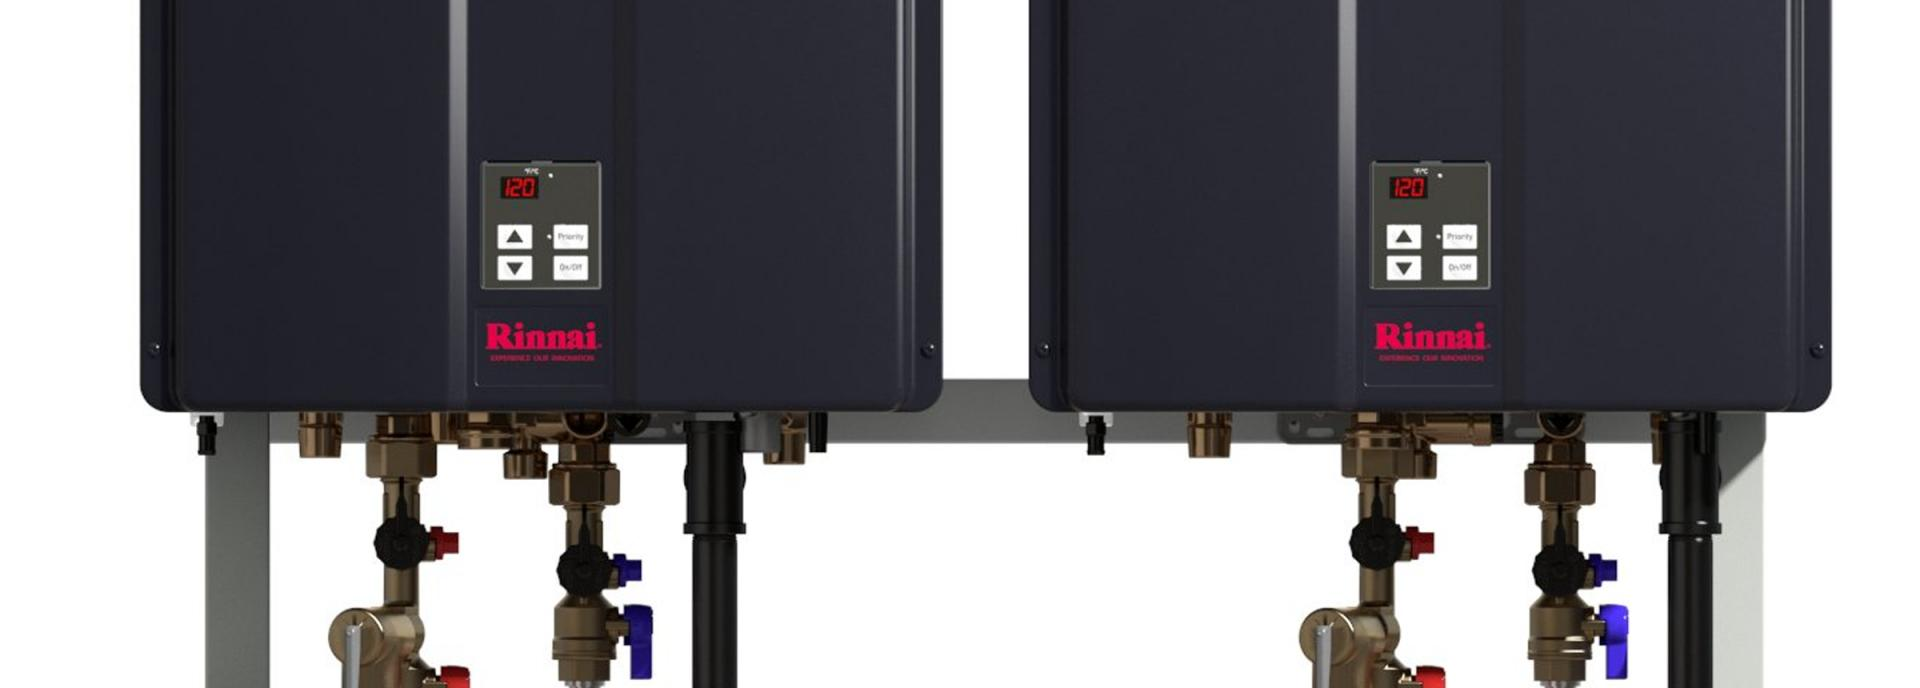 hight resolution of cu199 models rinnai america cu199 models rinnai boilers wiring diagram